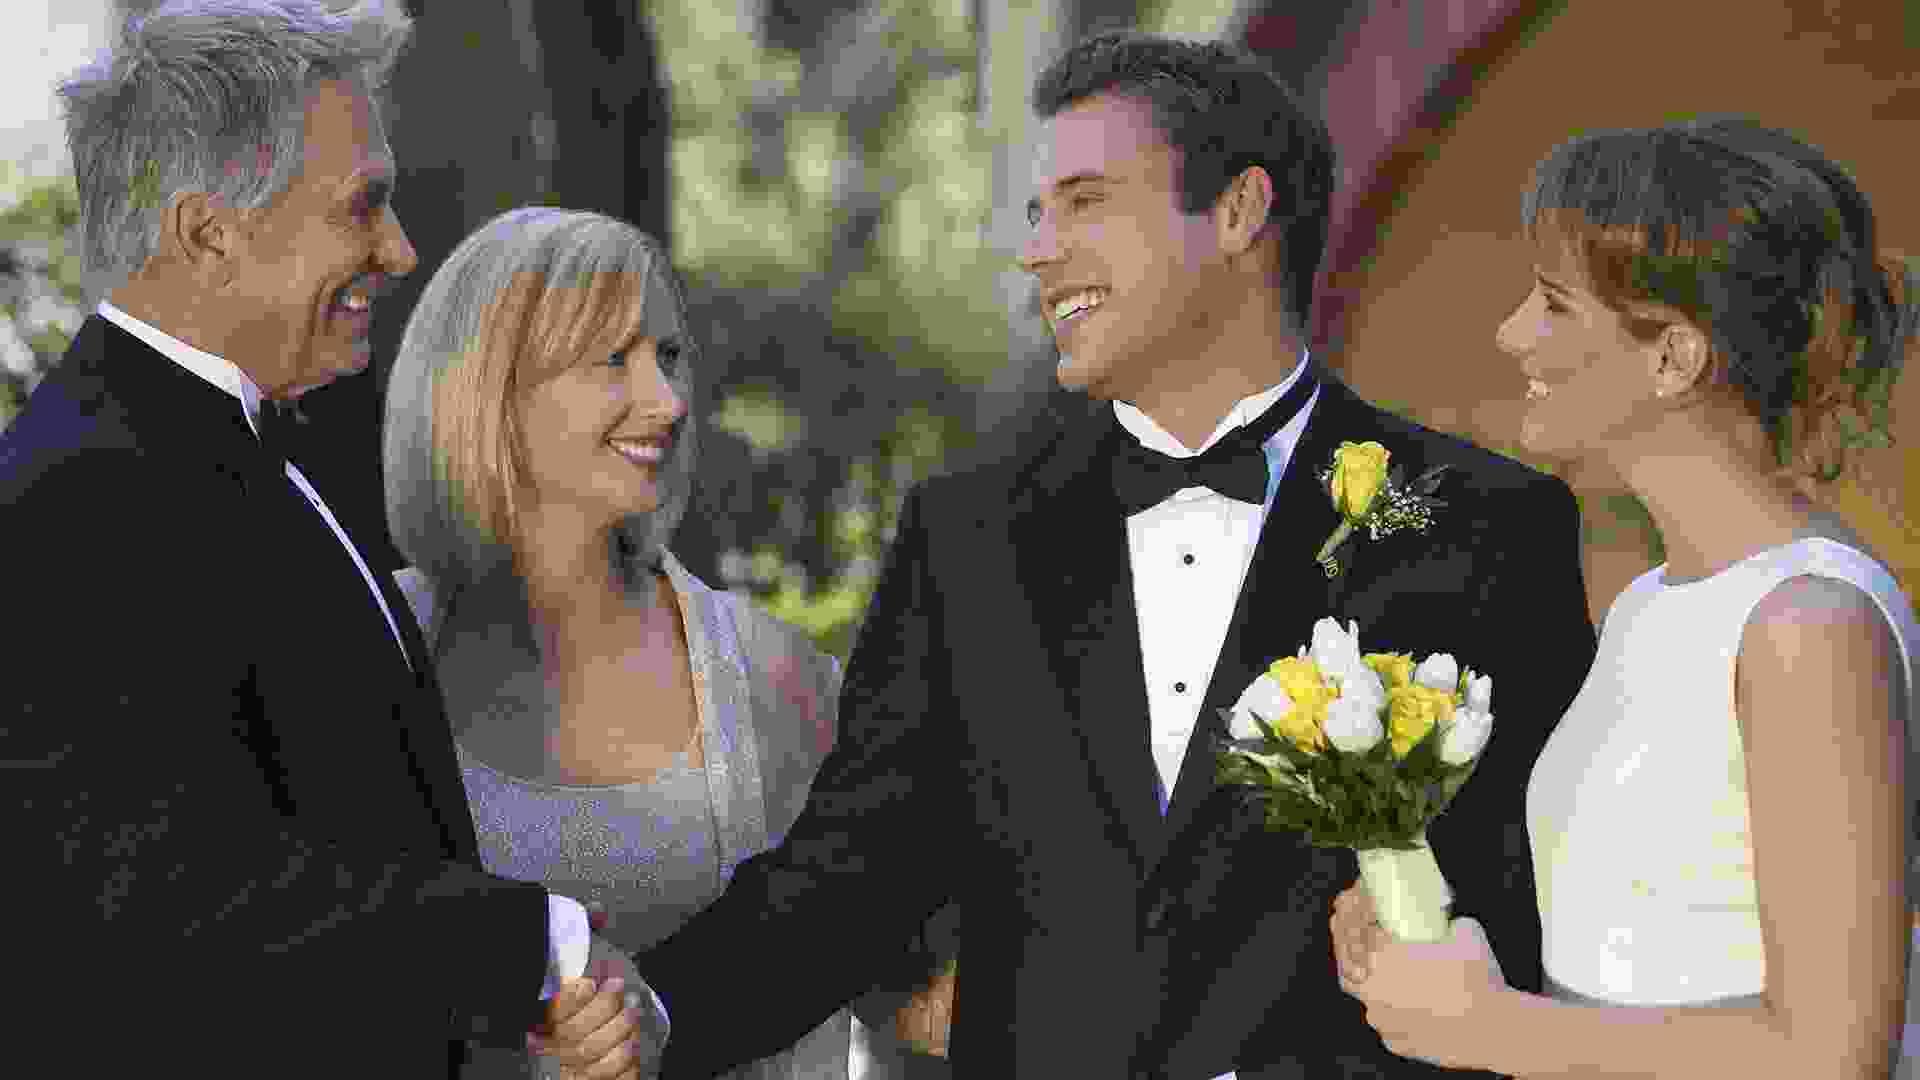 Jacques weds Alaina